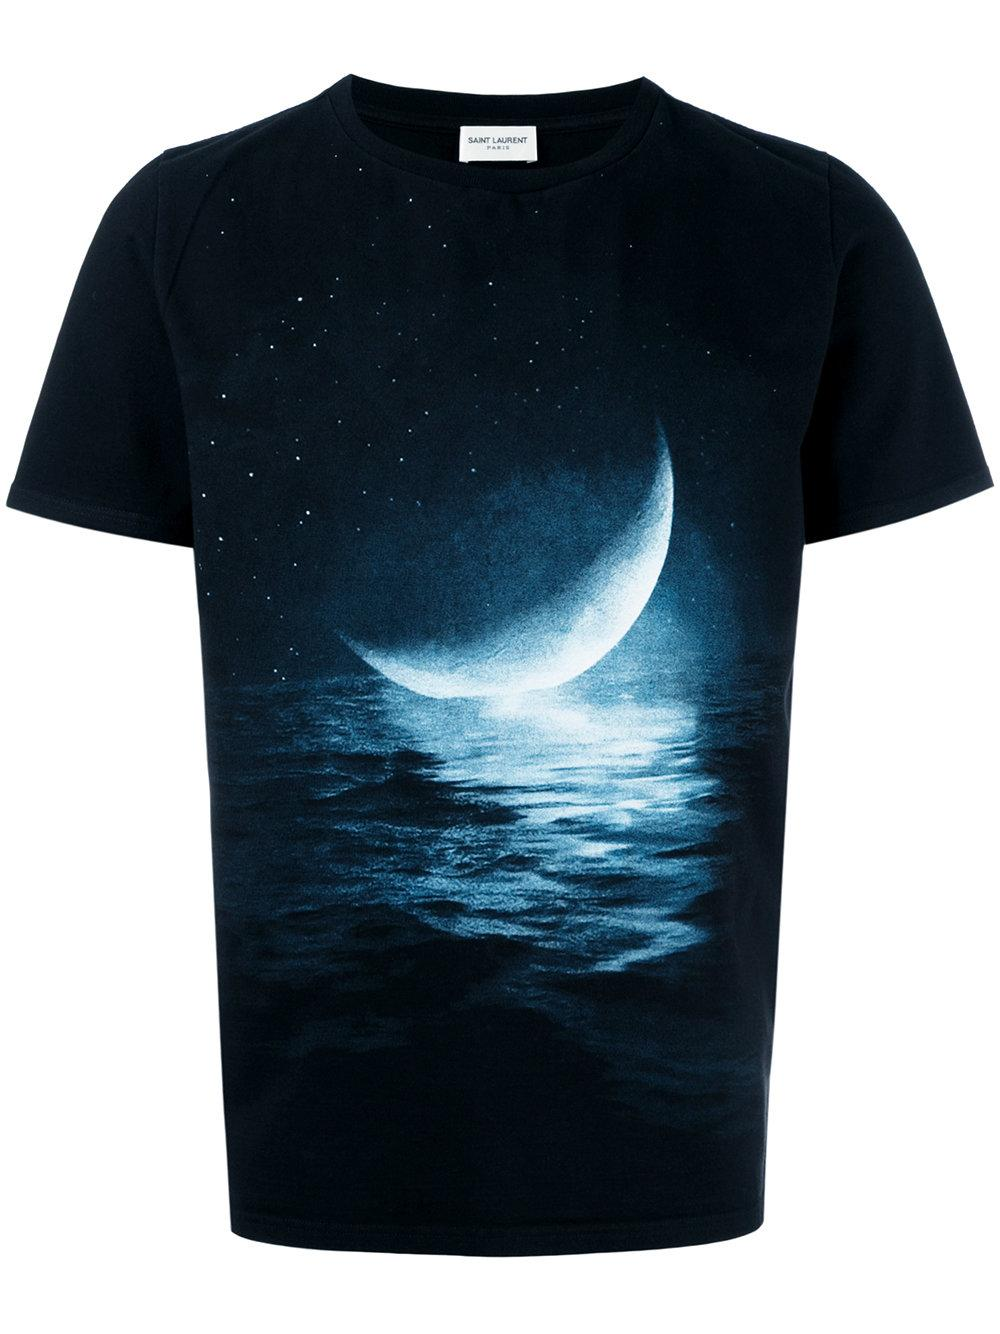 Saint laurent moon print t shirt in black for men lyst for Saint laurent t shirt